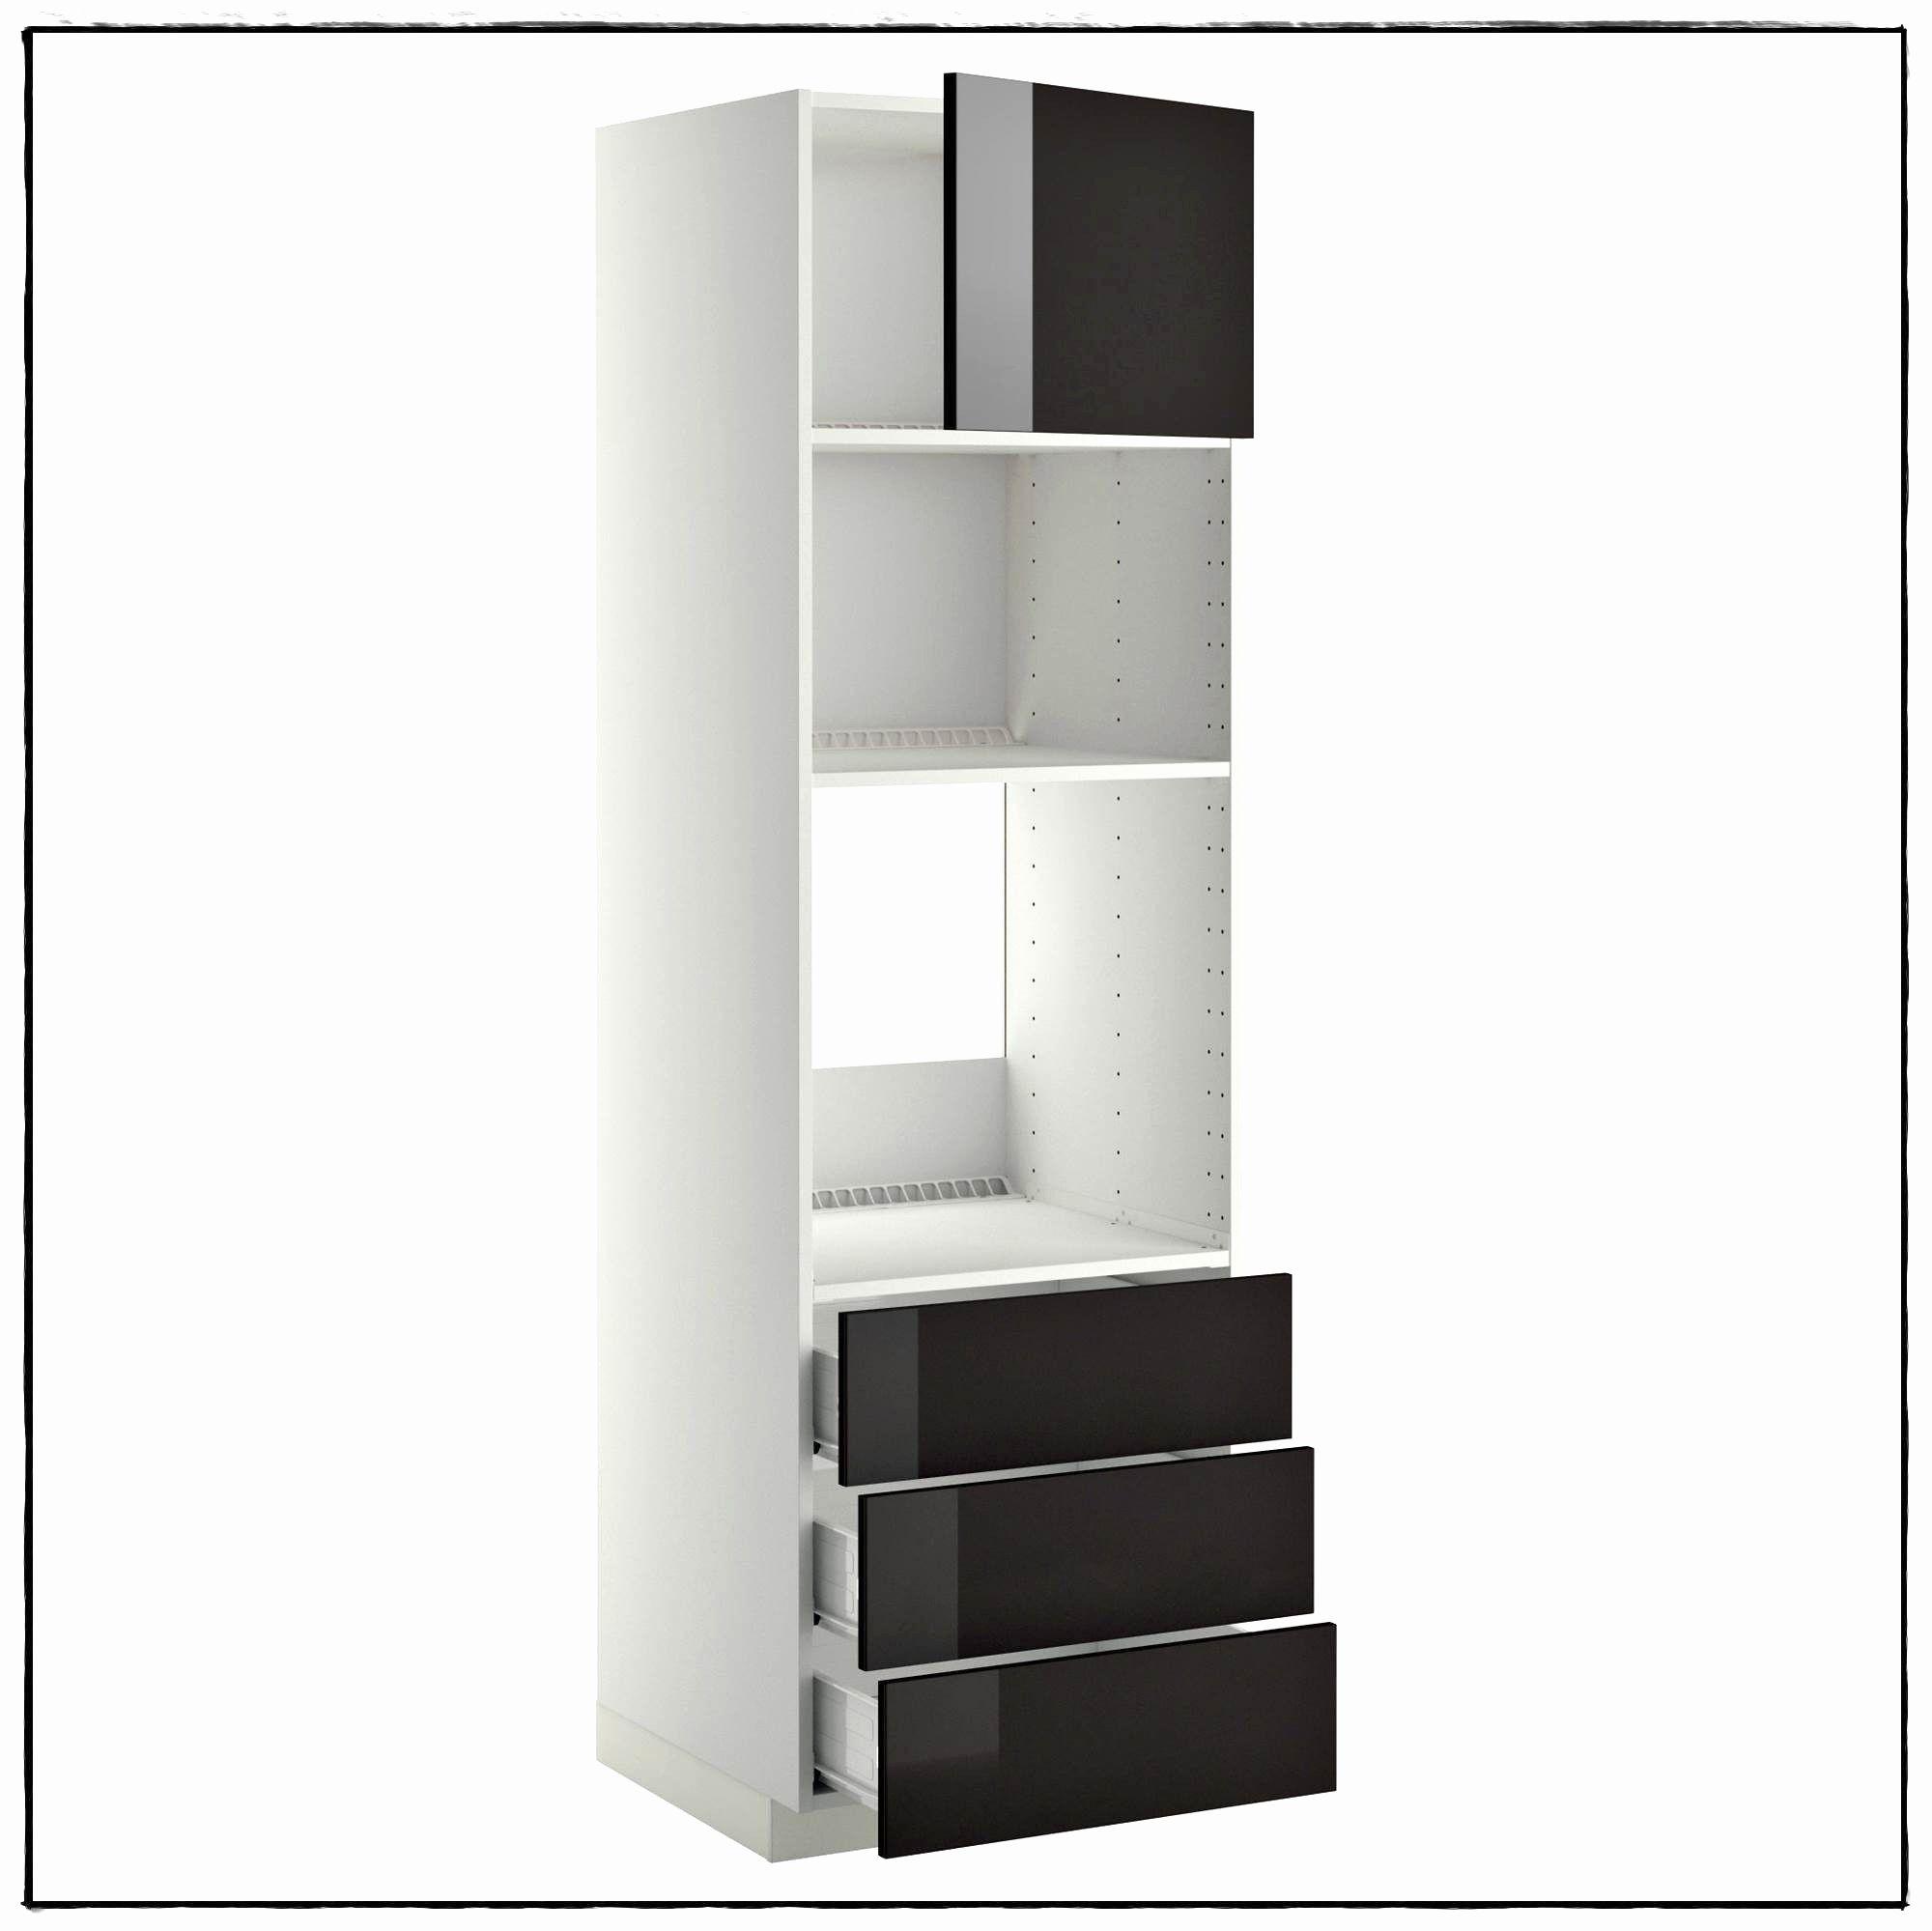 Armoire Portes Coulissantes Miroir Armoire Portes Coulissantes Miroir Charmant Porte De Placard Sur Home Decor Furniture Diy Storage Organiser Ikea Makeover